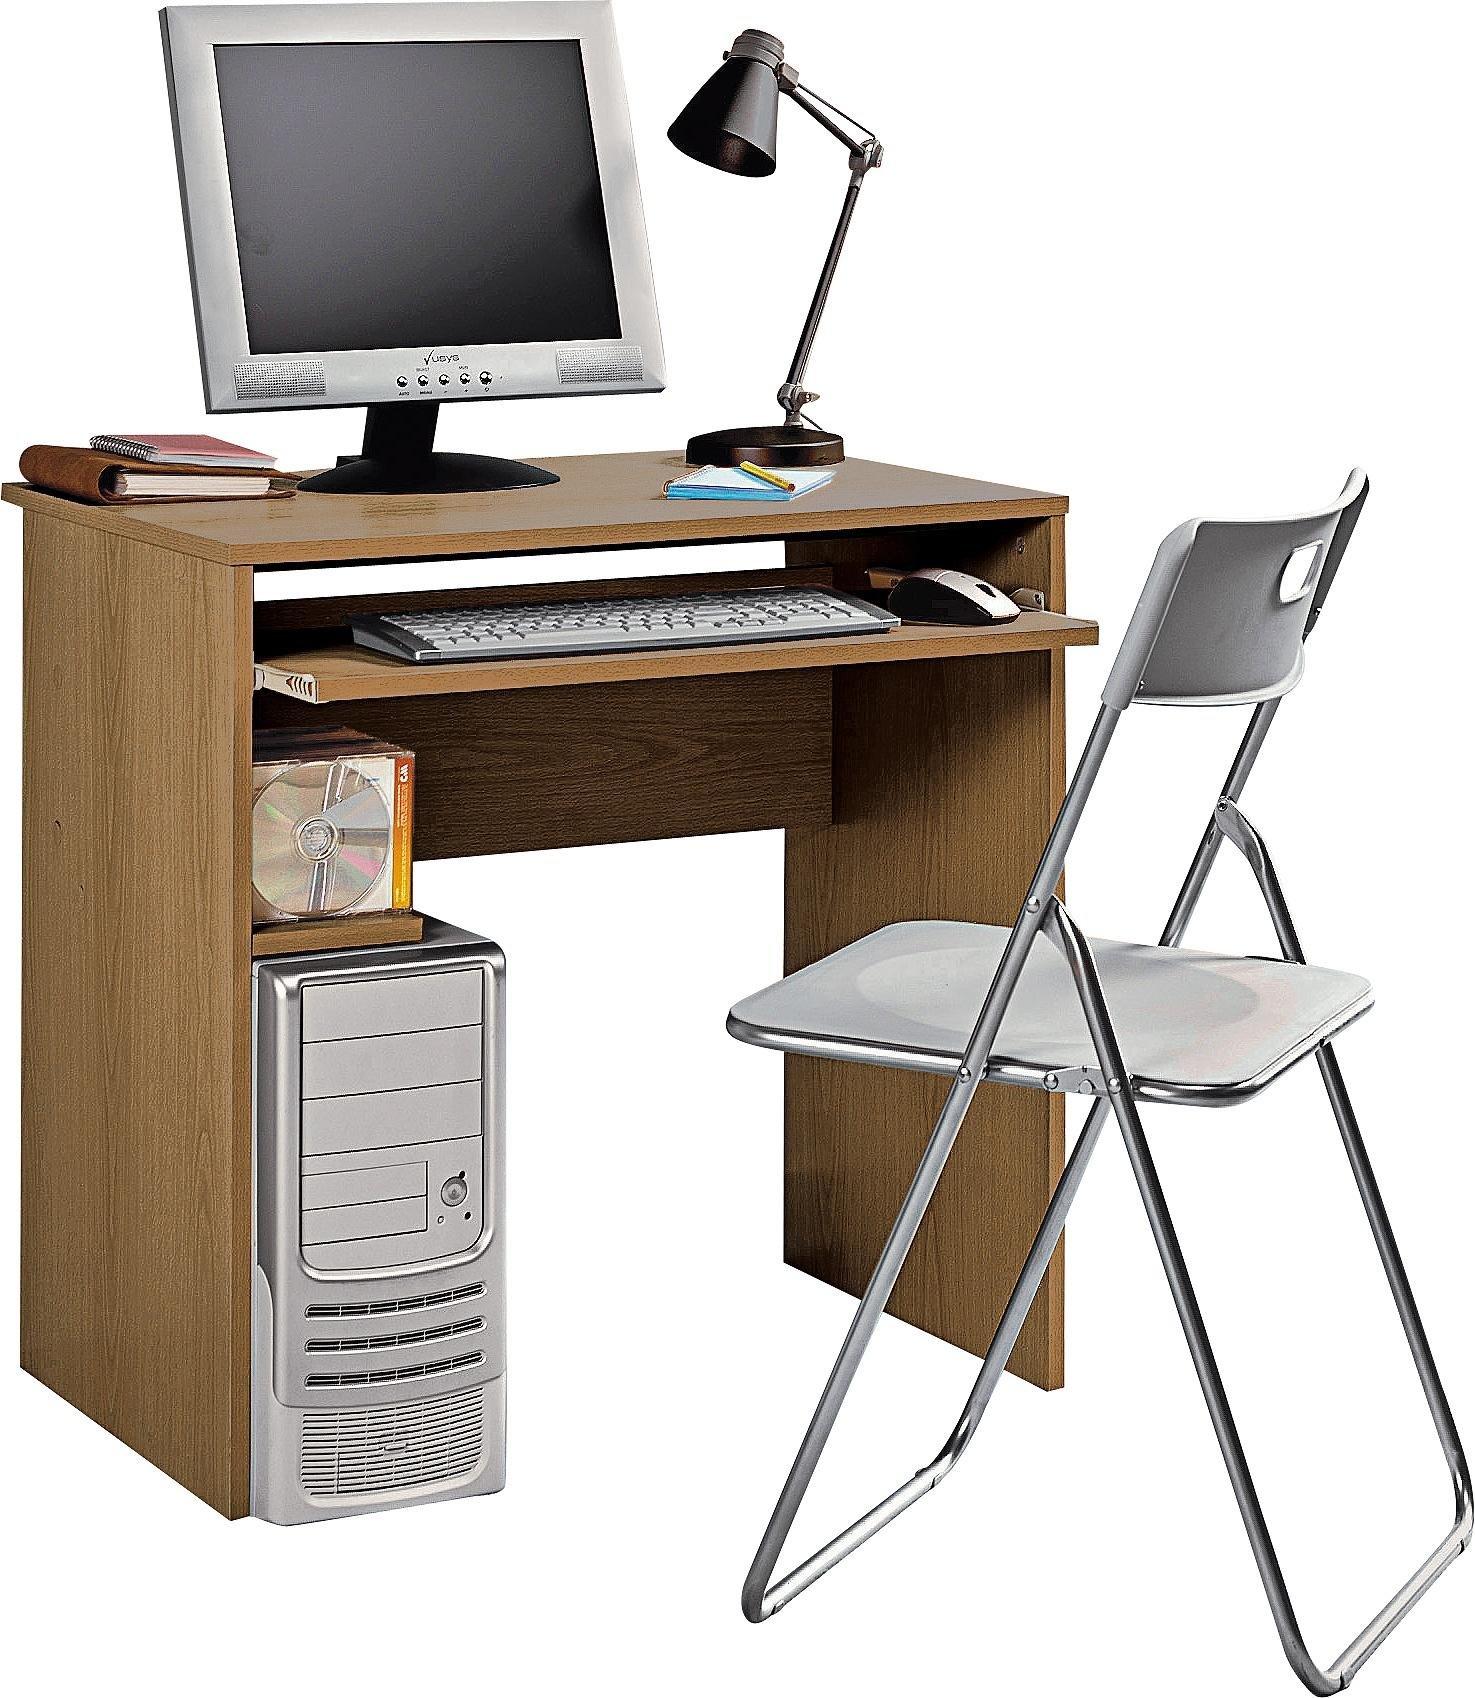 Argos Home Office Desk and Chair Set - Oak Effect